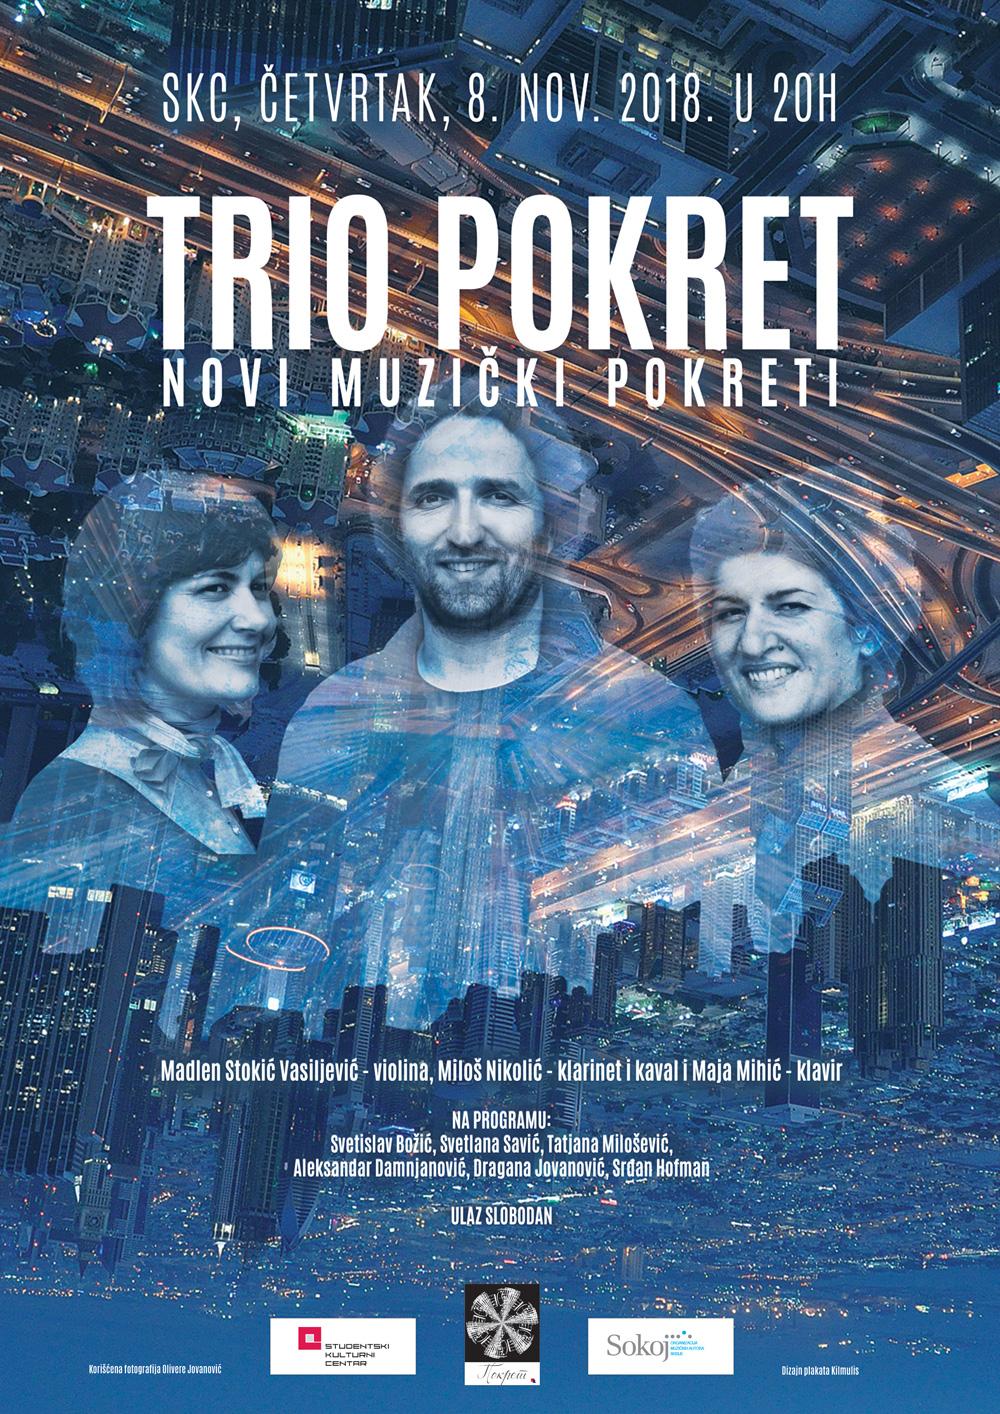 Kilmulis design - Trio Pokret - poster 03